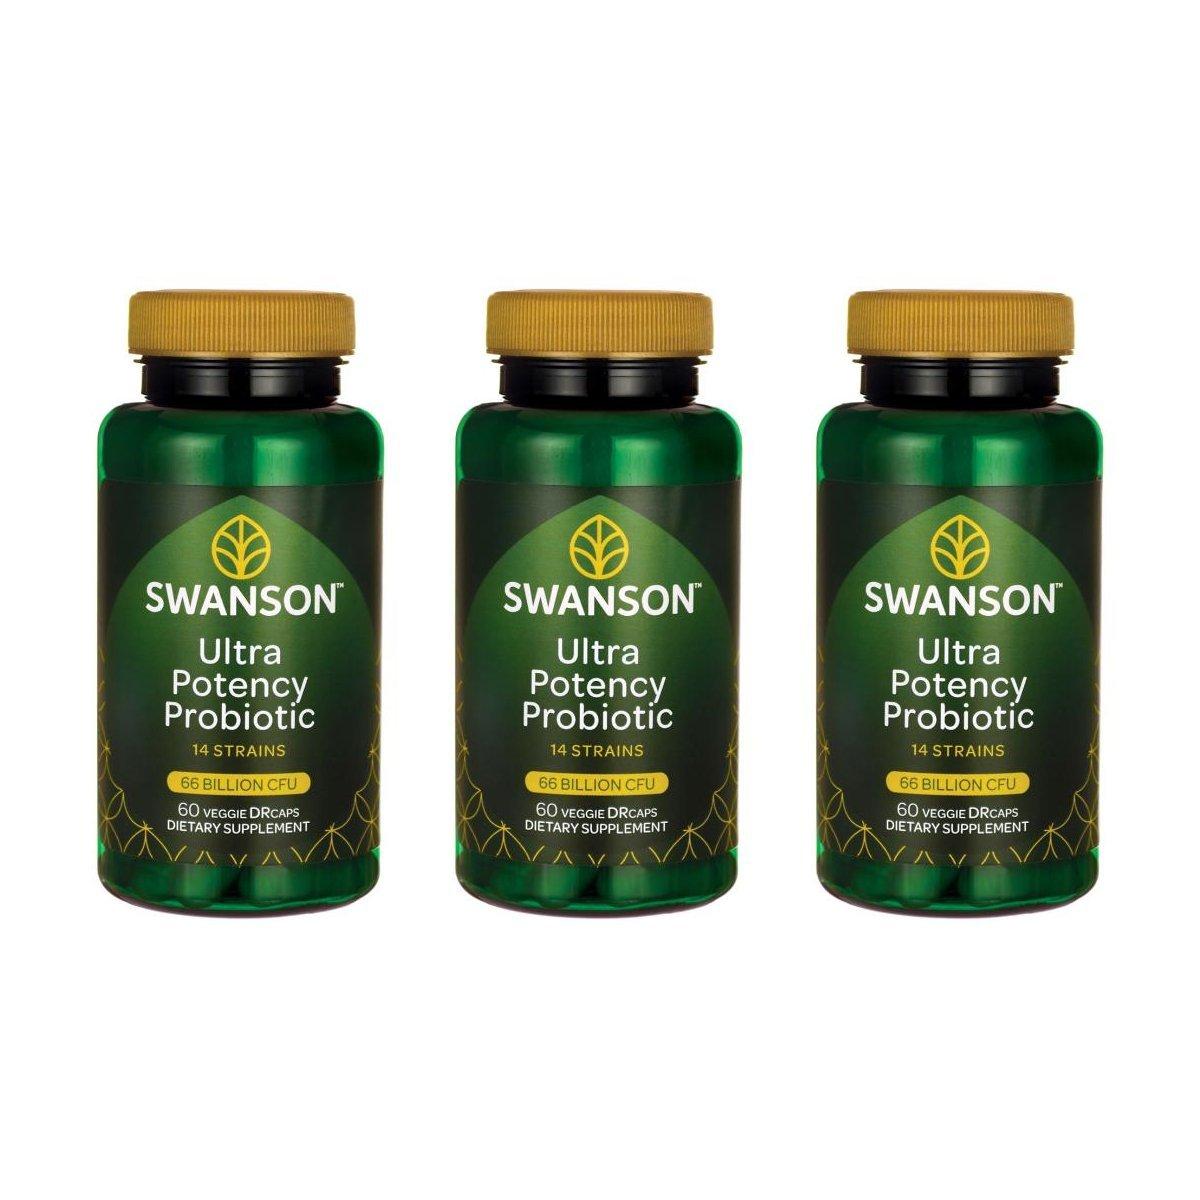 Swanson Ultra Potency Probiotic Digestive Health Immune System Support 66 Billion CFU Prebiotic NutraFlora scFOS 60 DRcaps Veggie Capsules (Caps) (3 Pack)